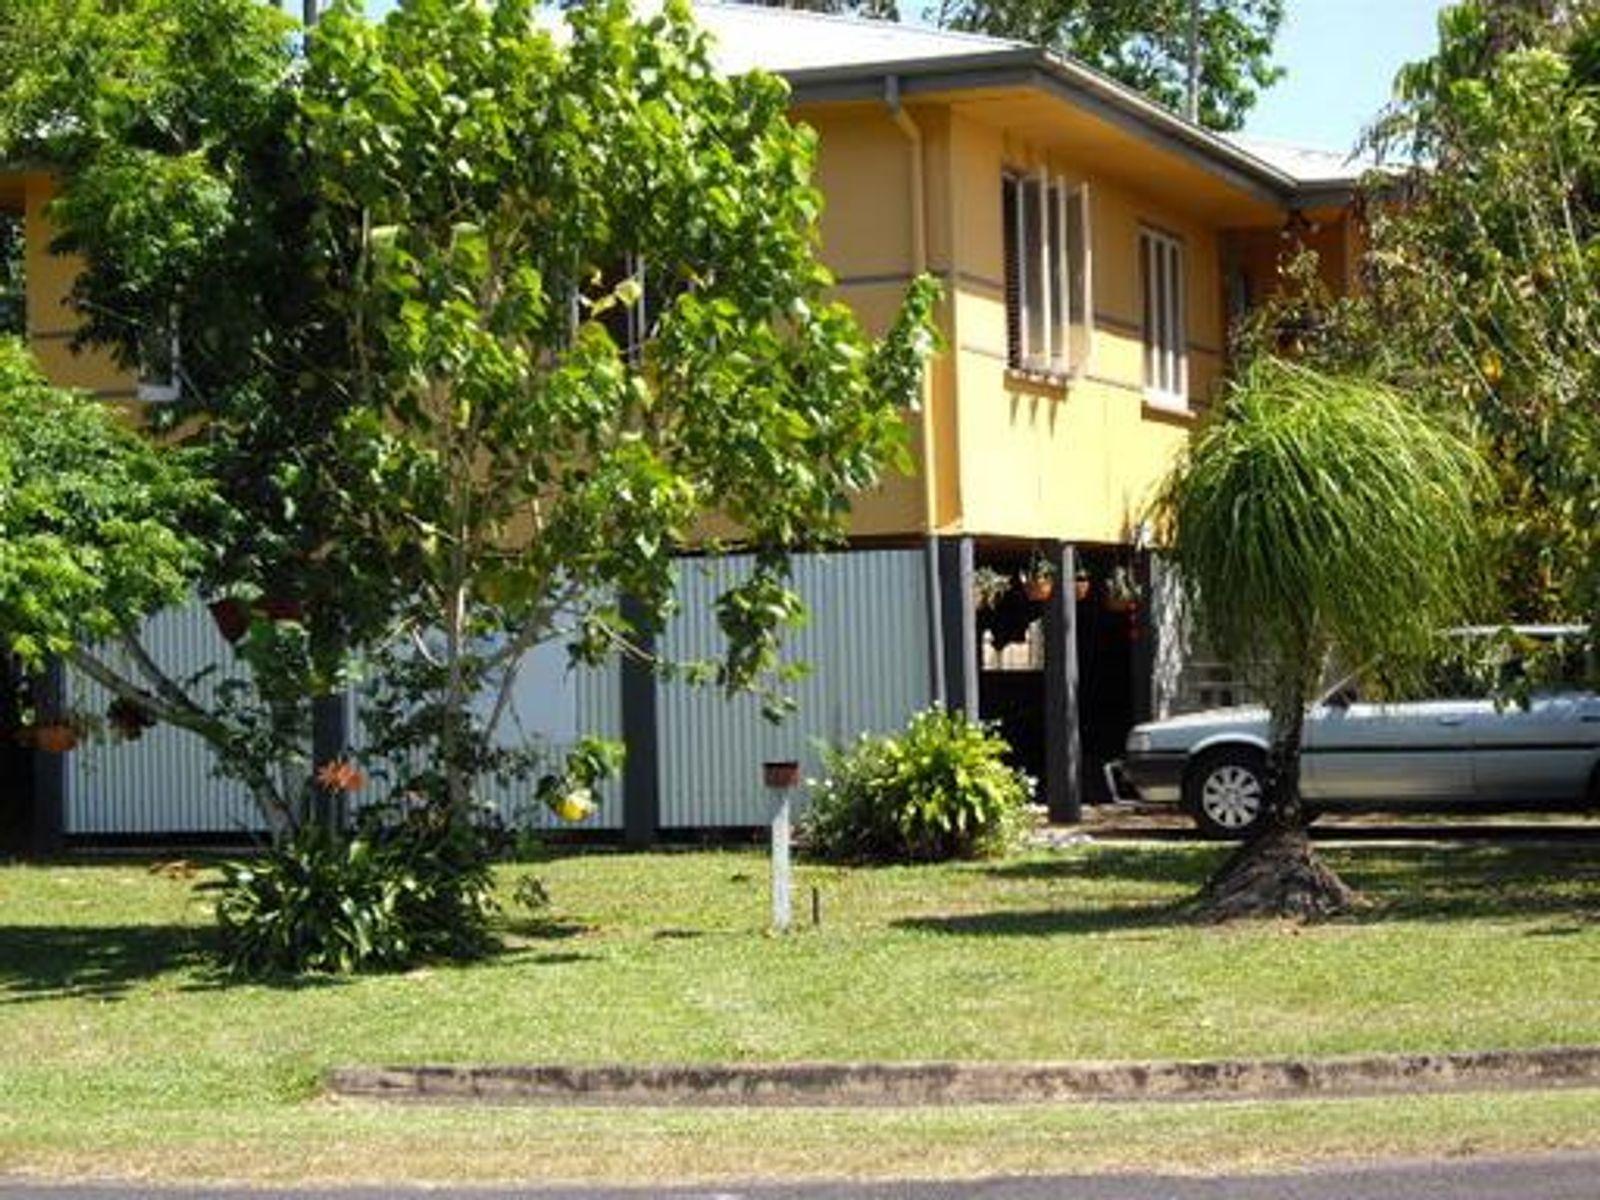 1 BOURKE STREET, South Innisfail, QLD 4860